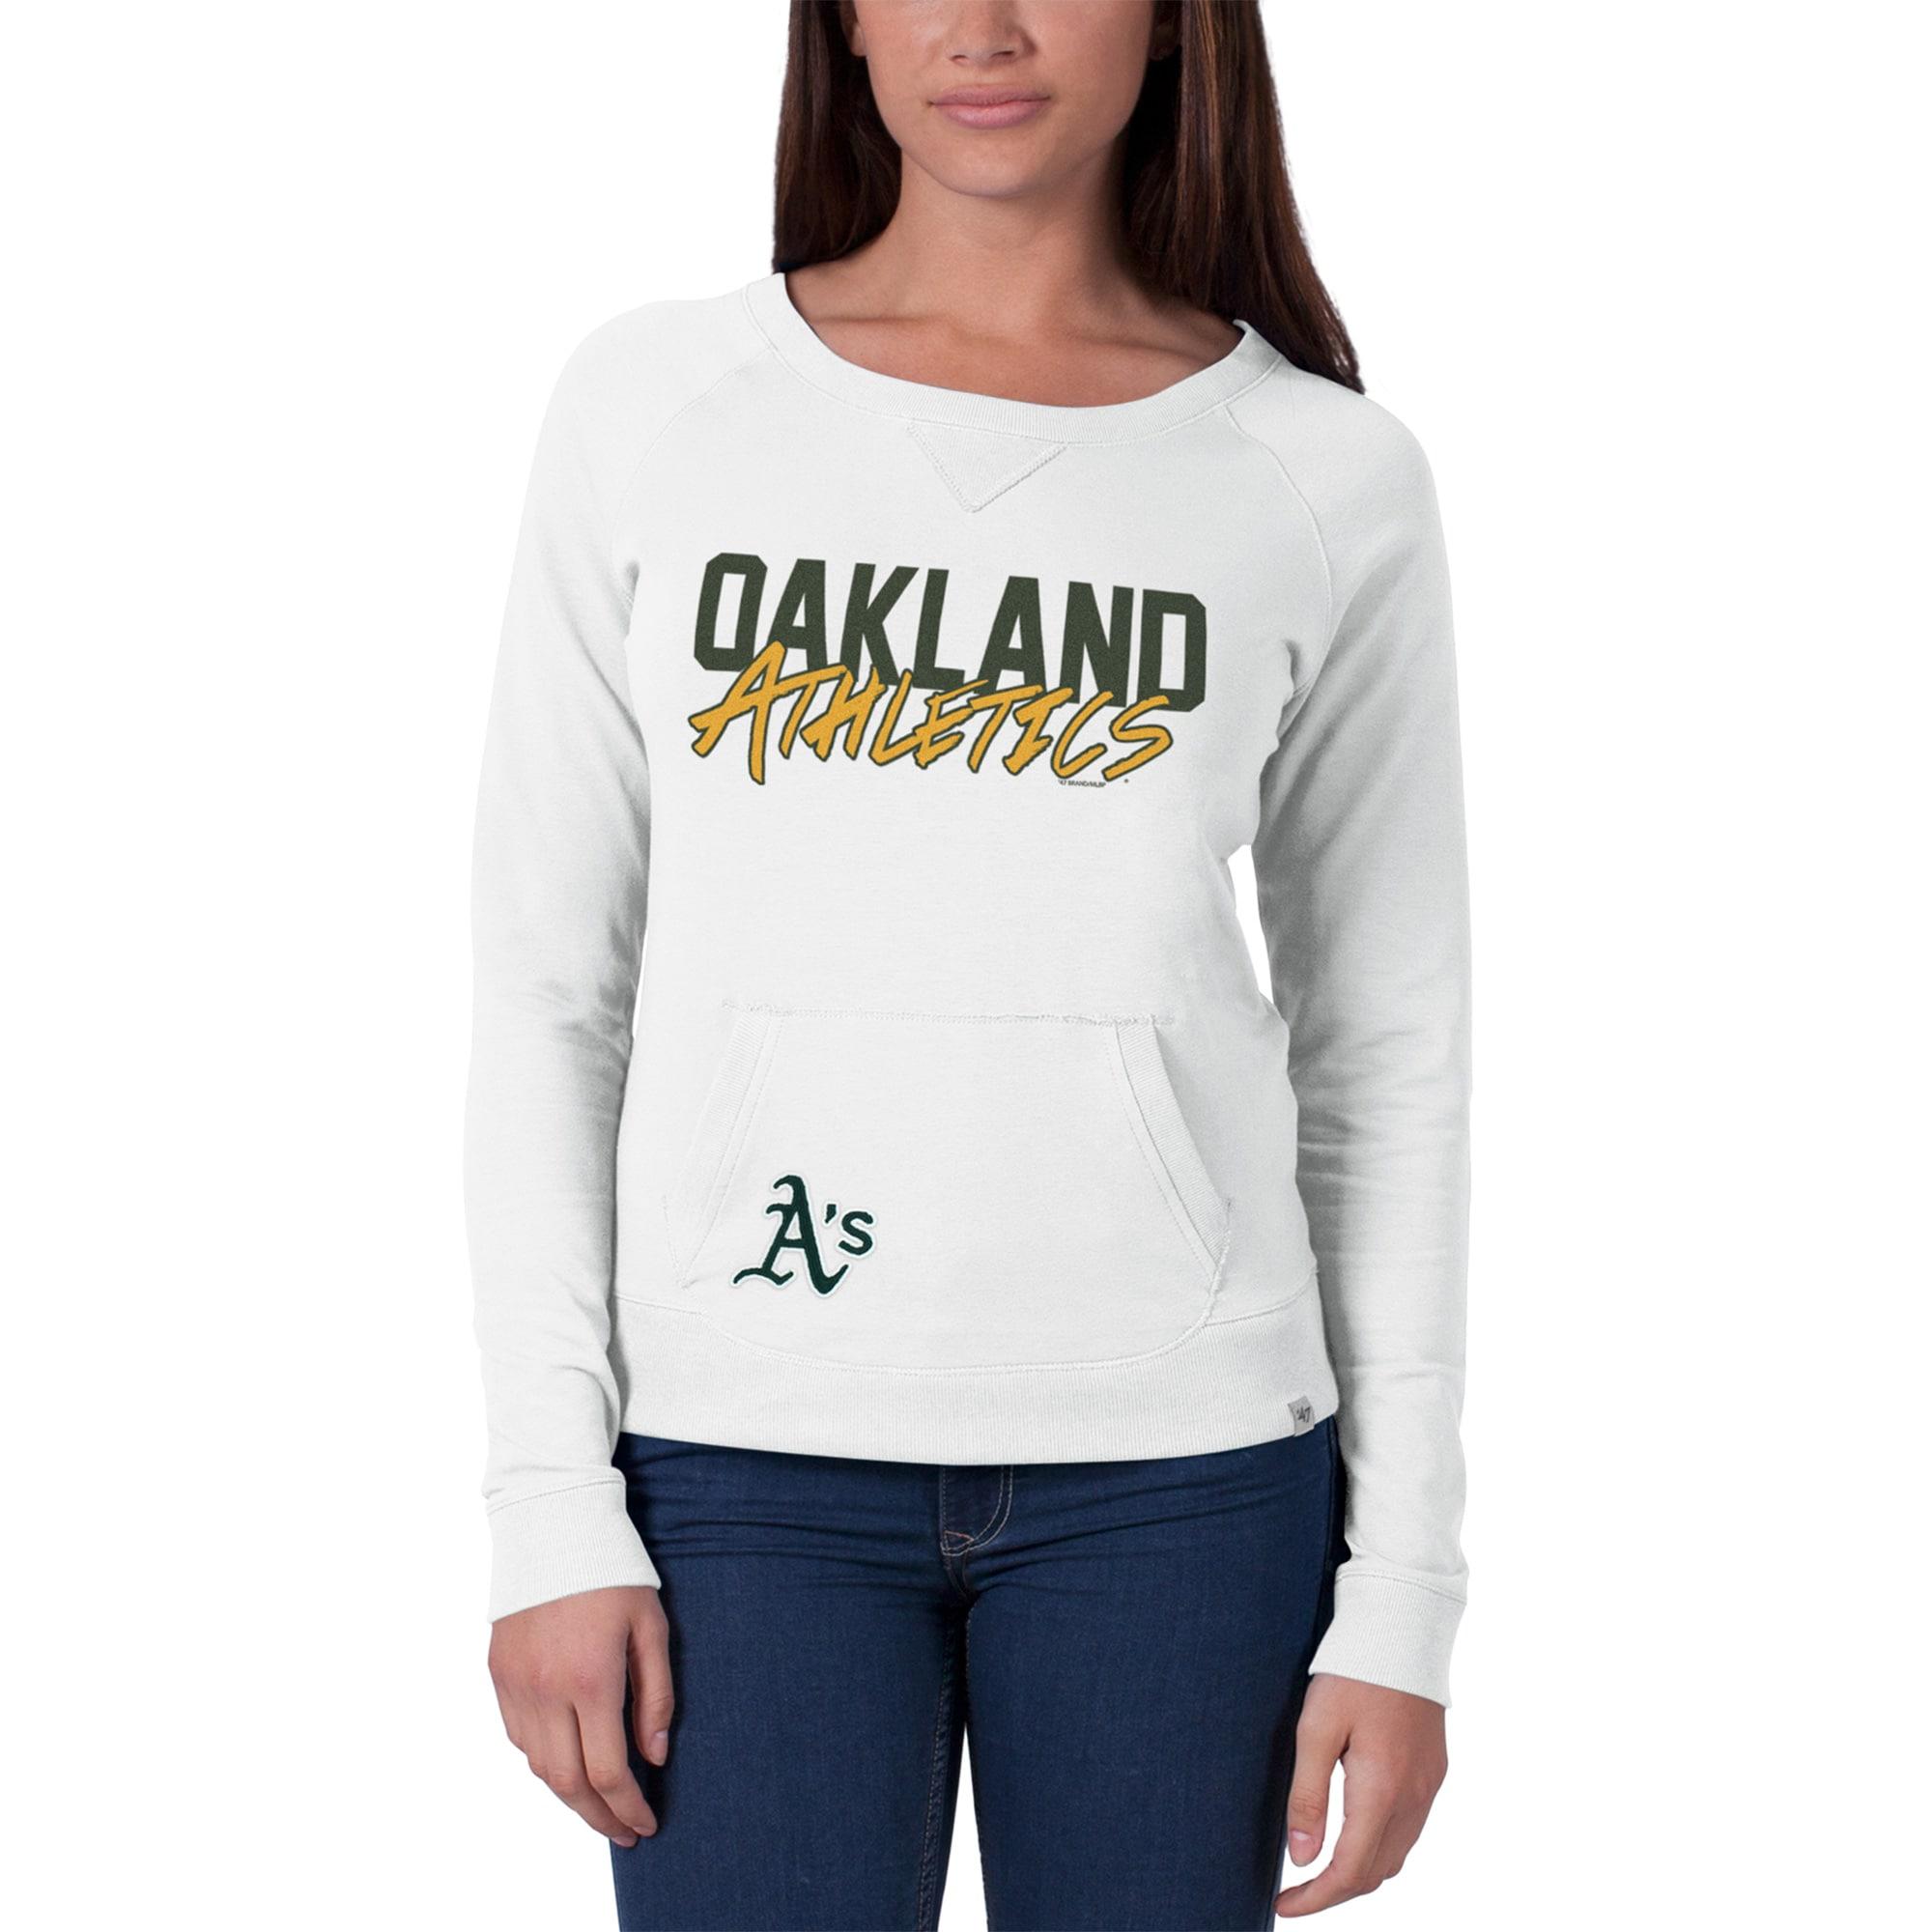 Oakland Athletics '47 Women's Gameday Crew Neck Sweater - White